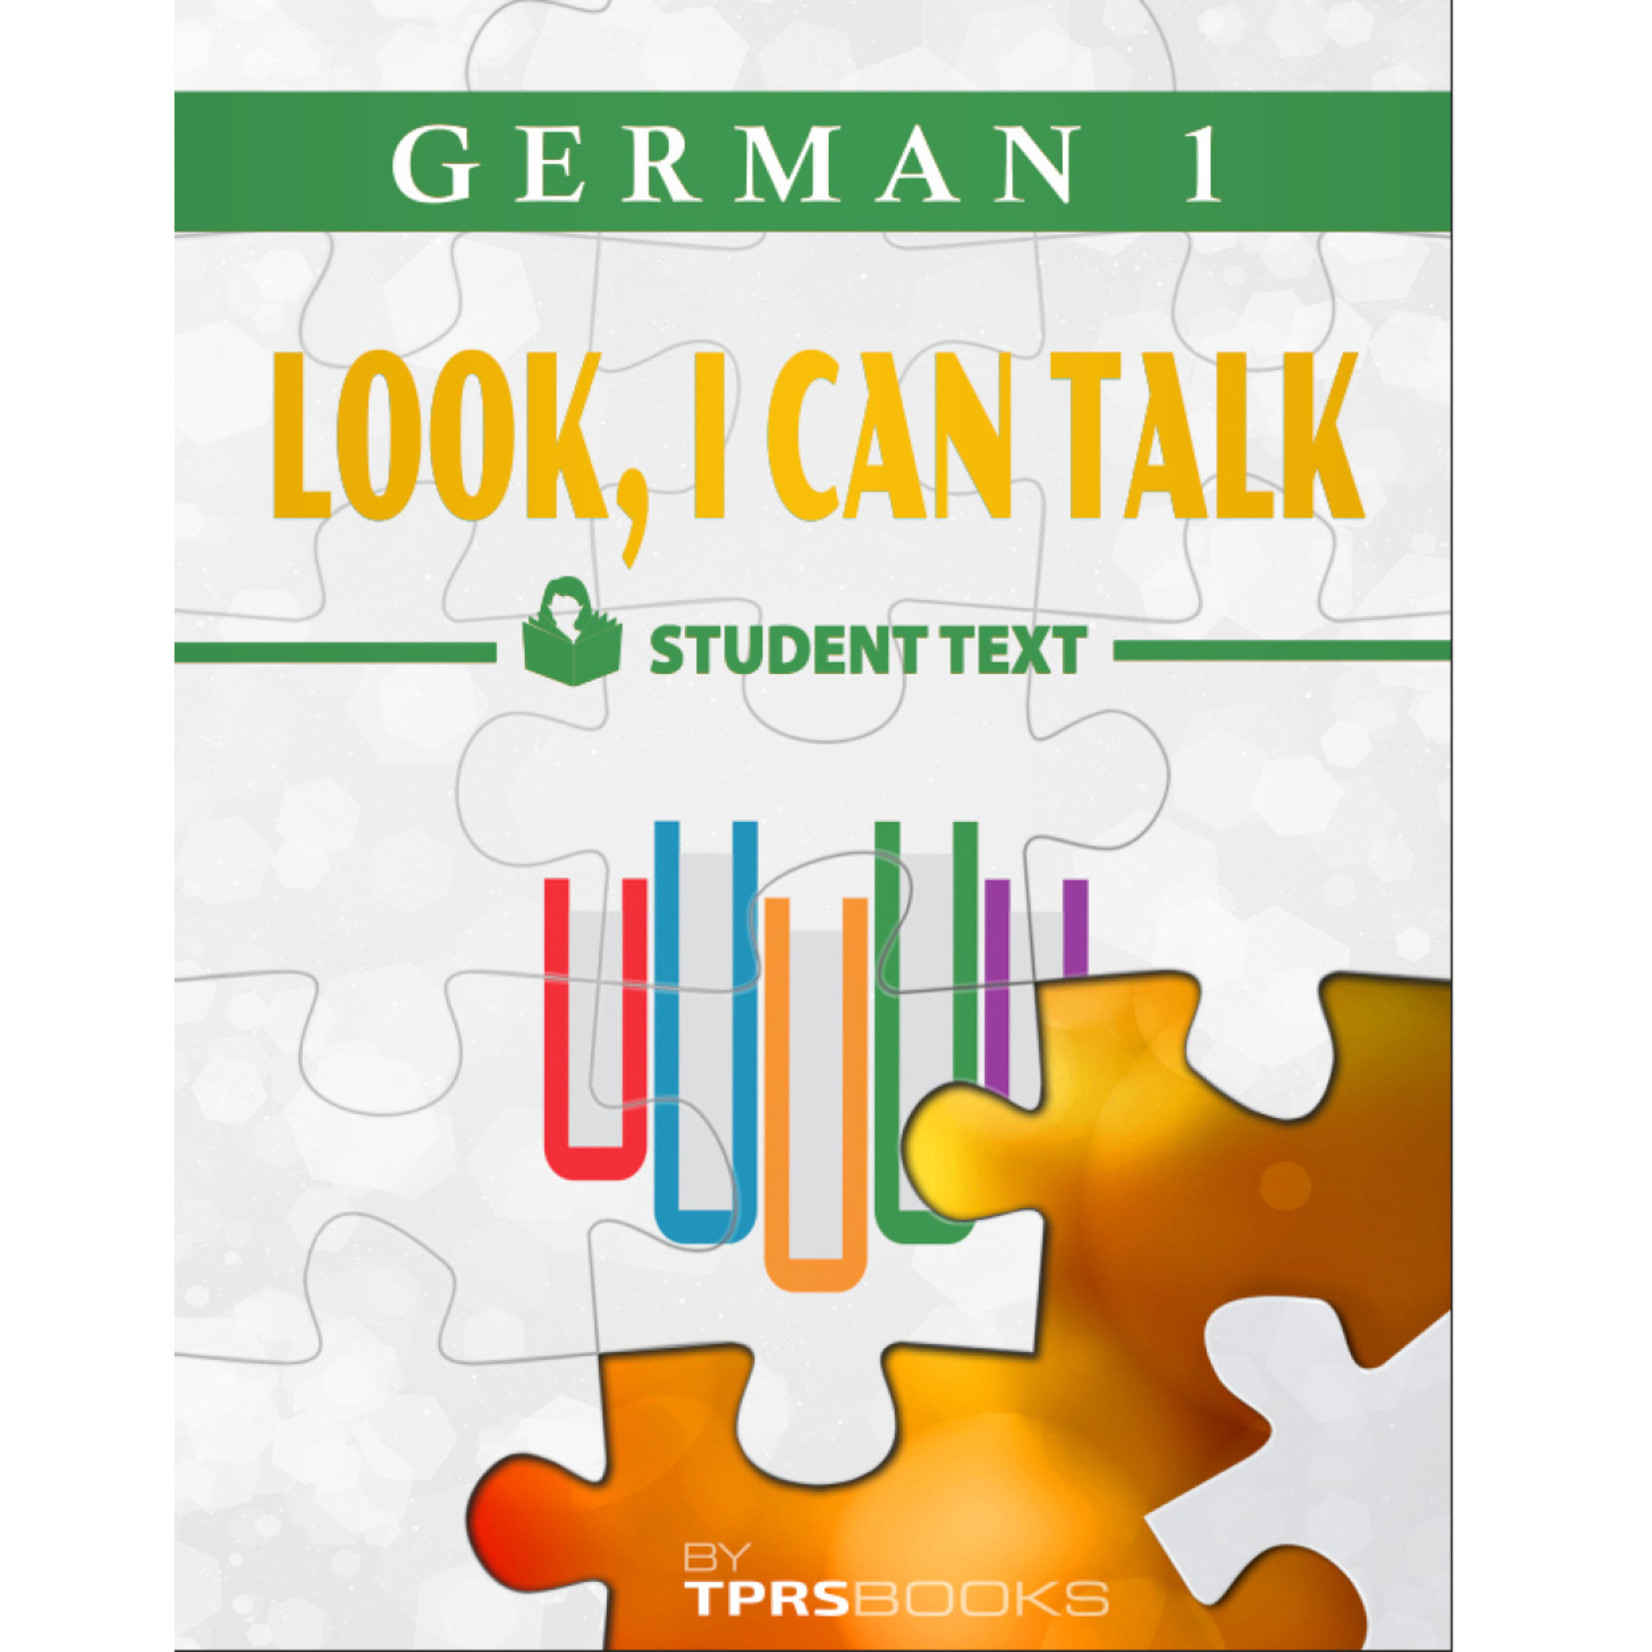 TPRS Books Duits 1 -  Look, I Can Talk! Werkboek